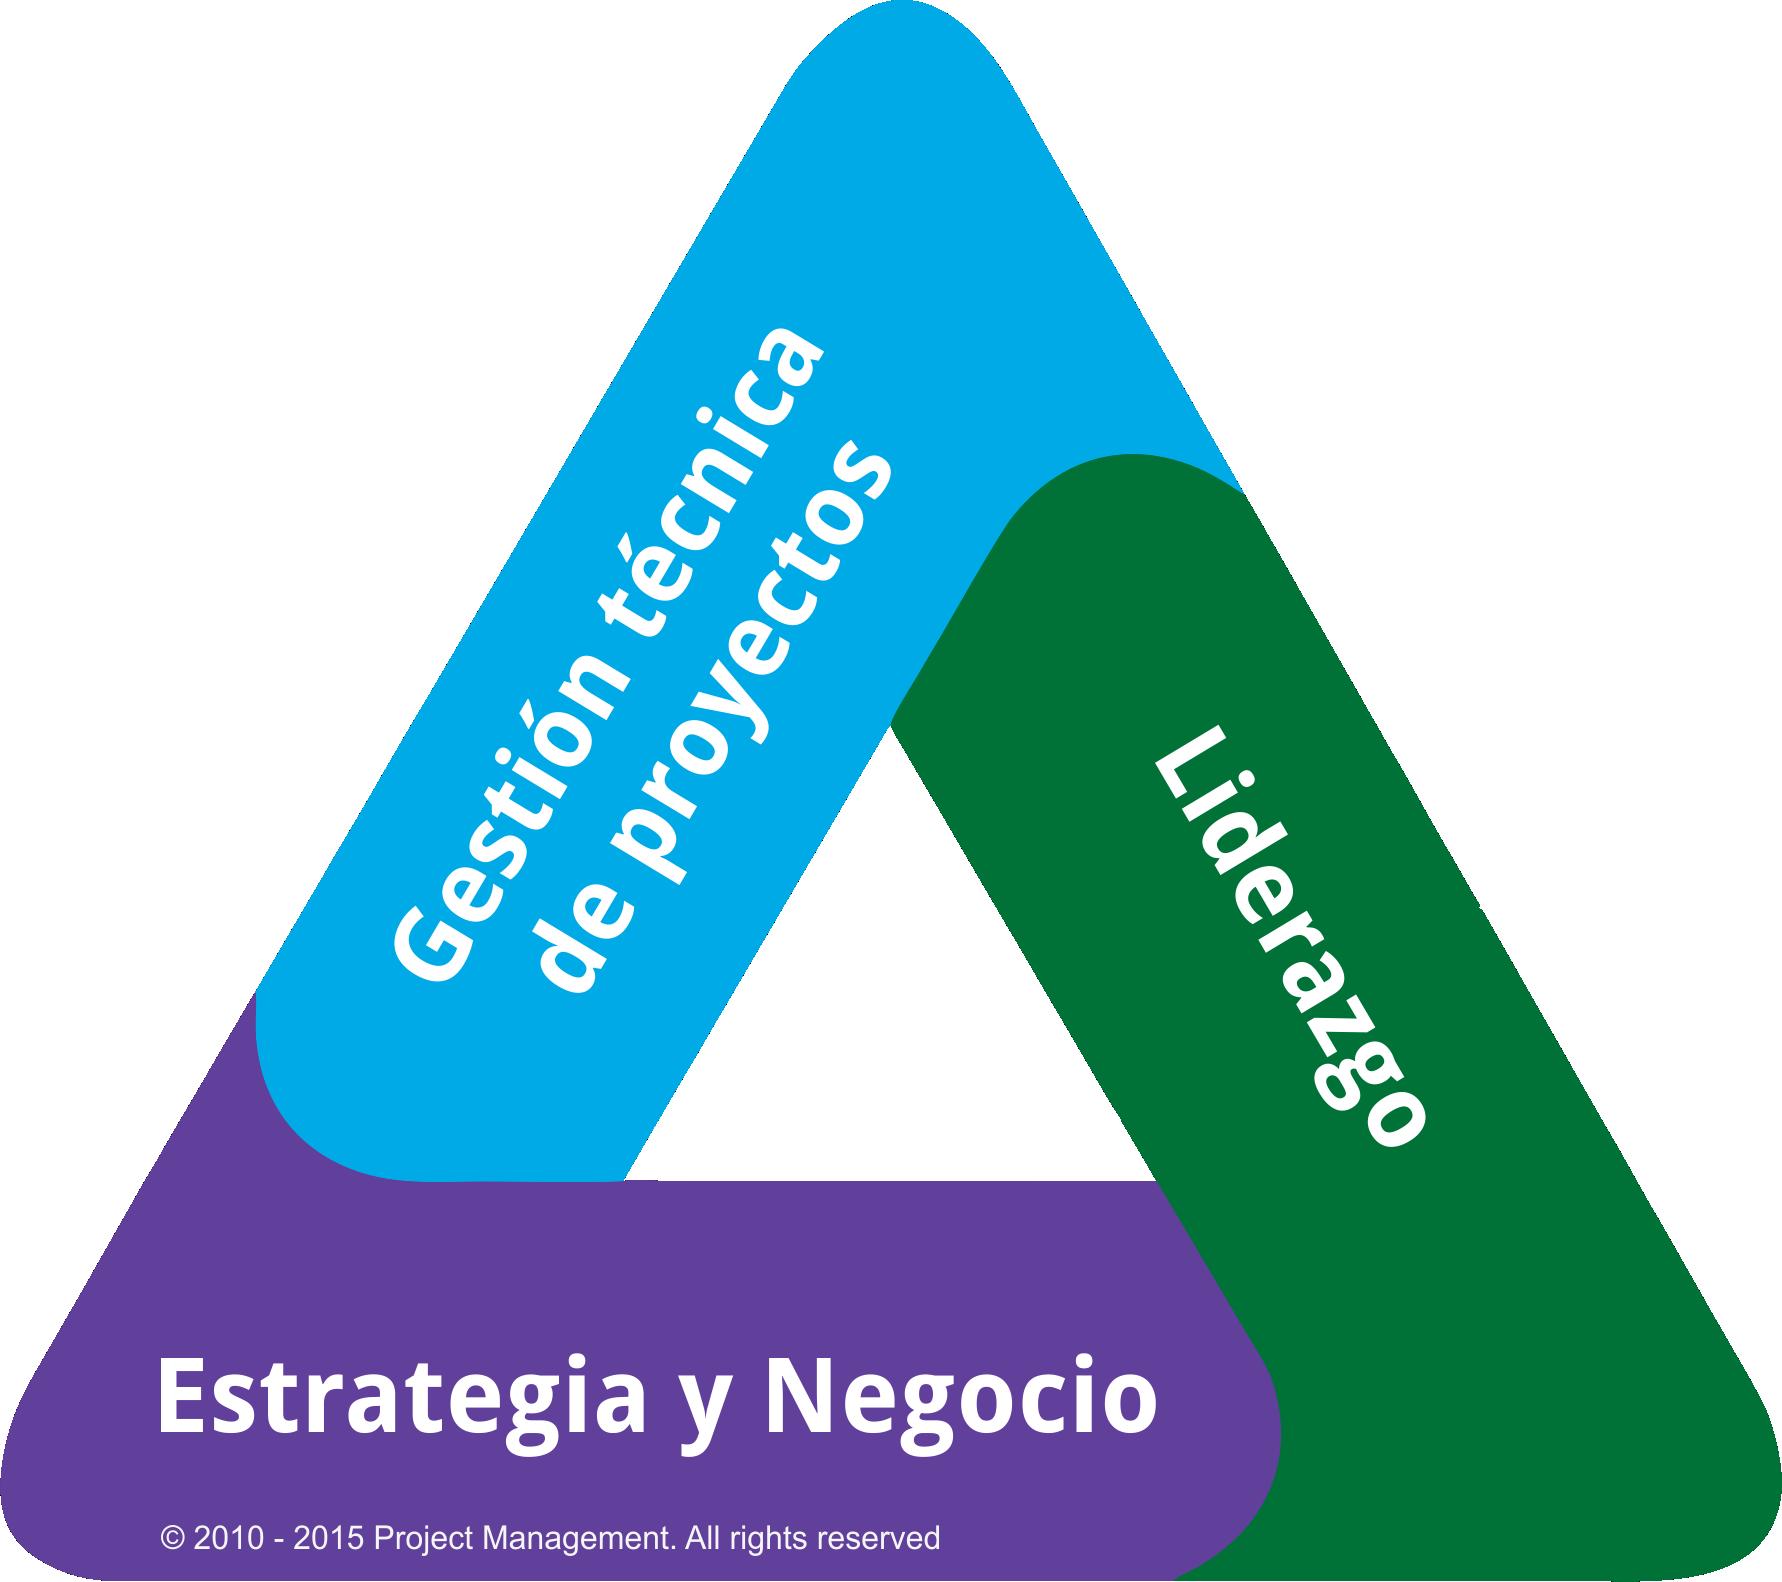 Triángulo del talento del PMP (project management professional) según PMI